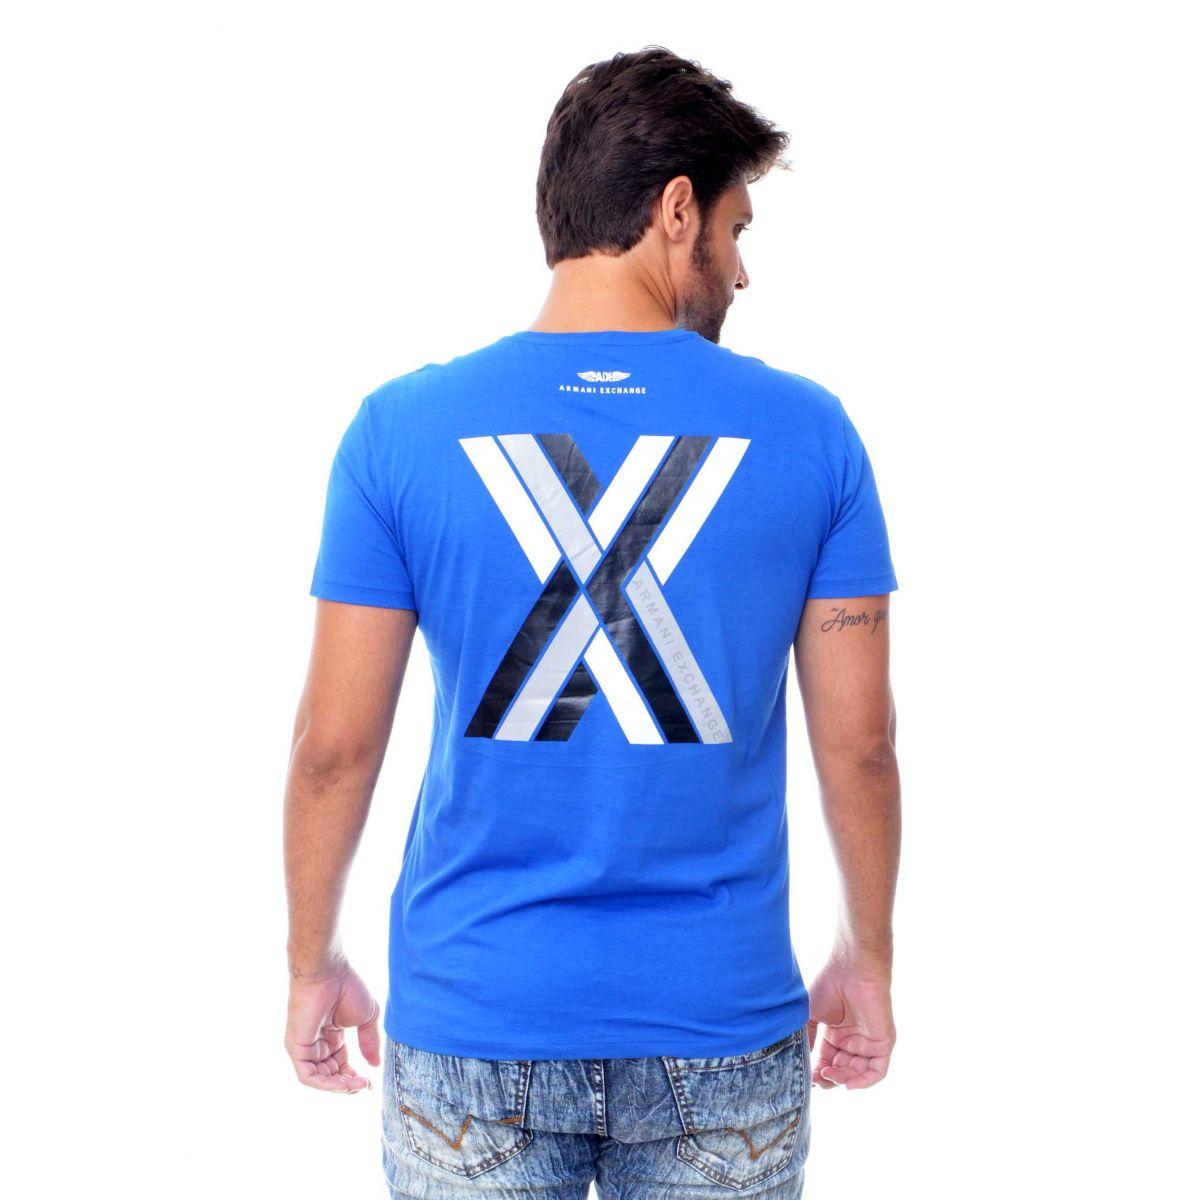 Camiseta Armani Exchange Logo X Azul  - Ca Brasileira